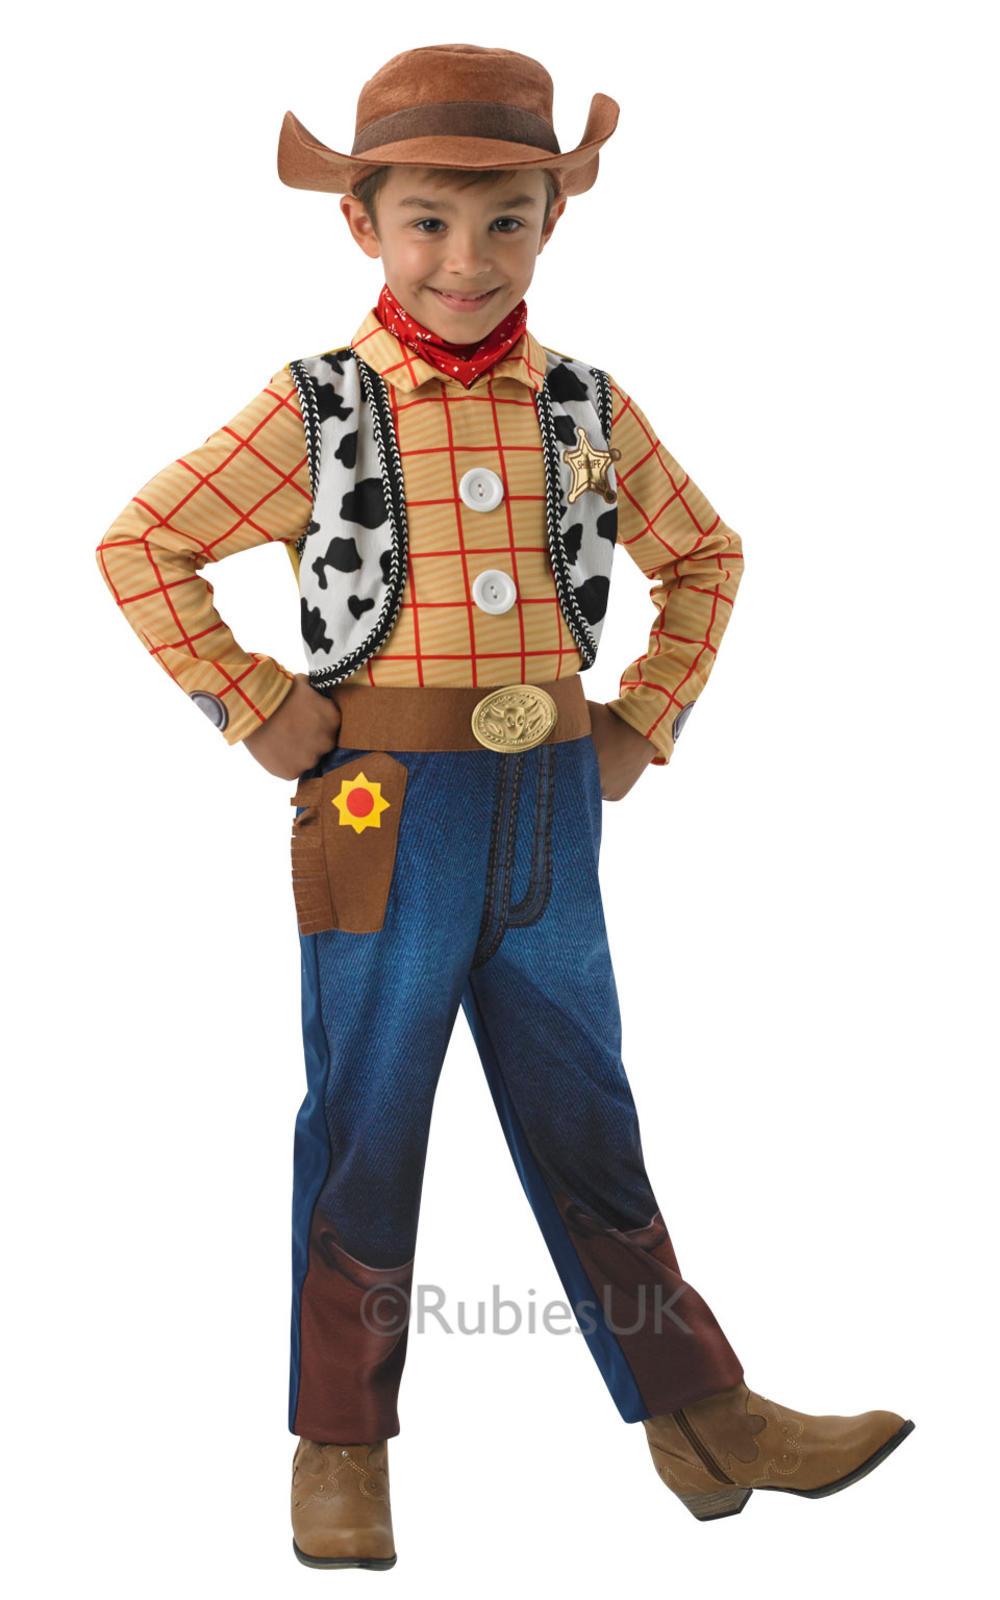 Deluxe Toy Story Woody + Hat Kids Fancy Dress Disney Cowboy Kids Childs Costume